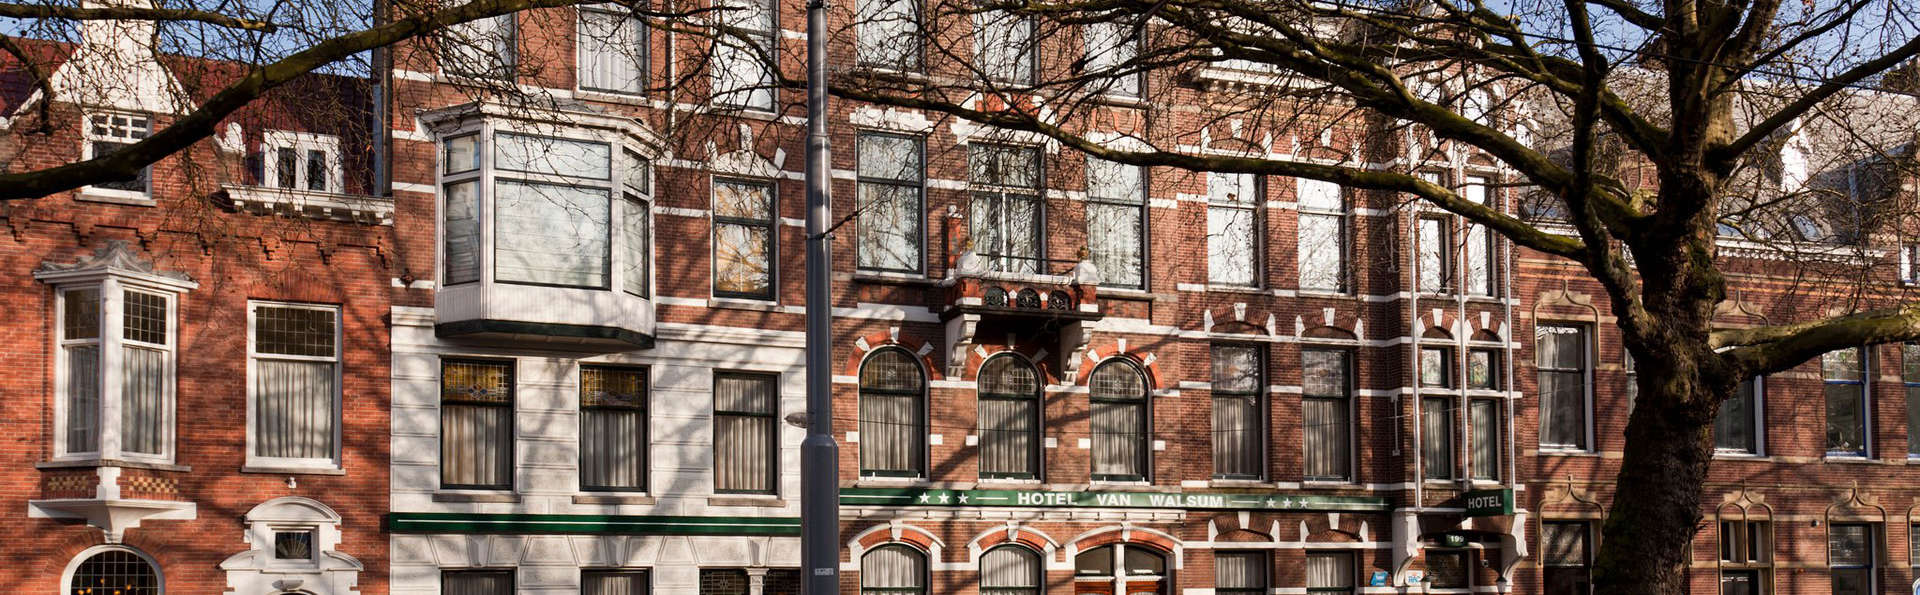 Hotel van Walsum - edit_front1.jpg